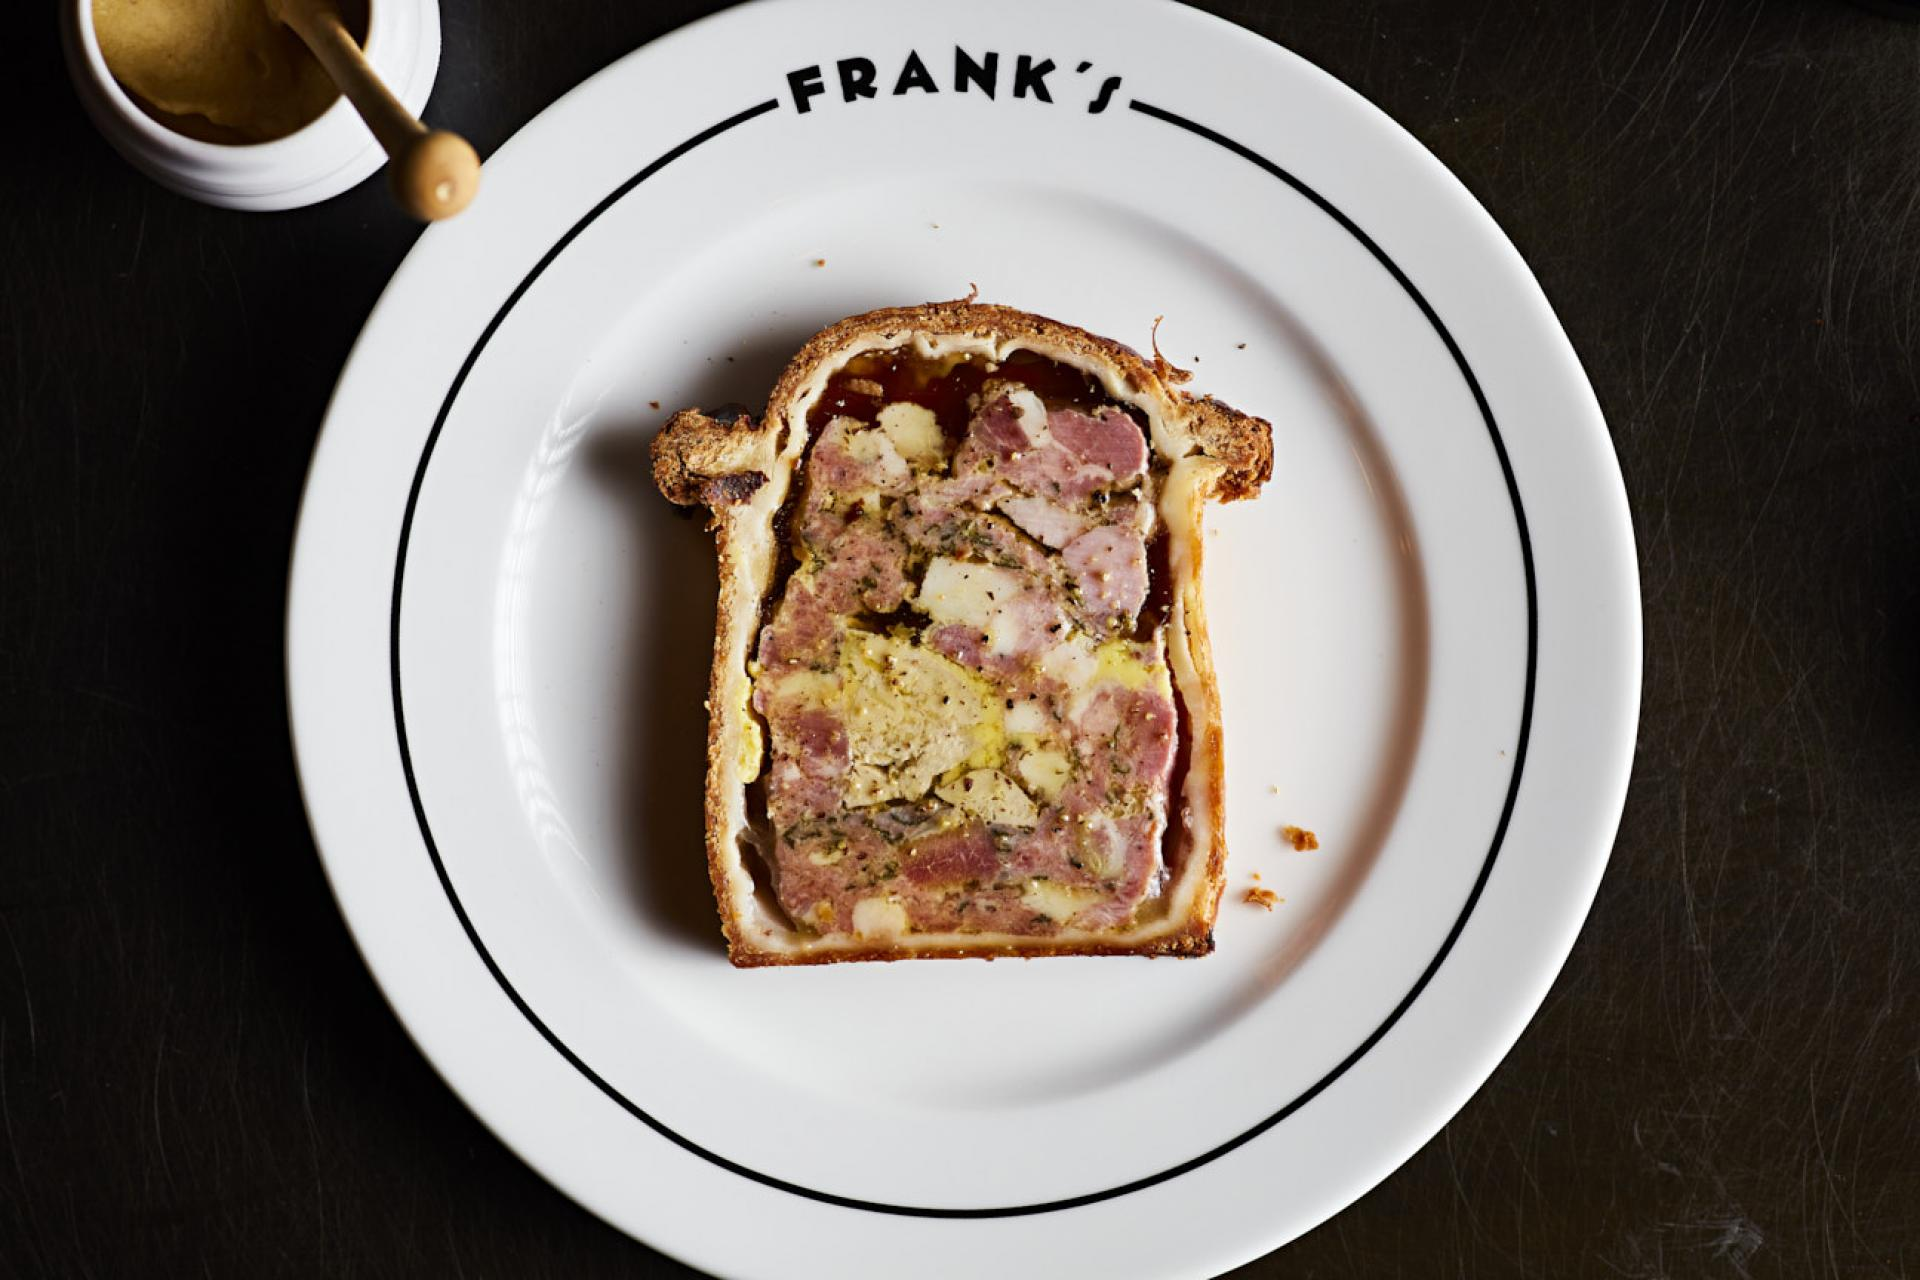 New London openings: Frank's Maison Francois